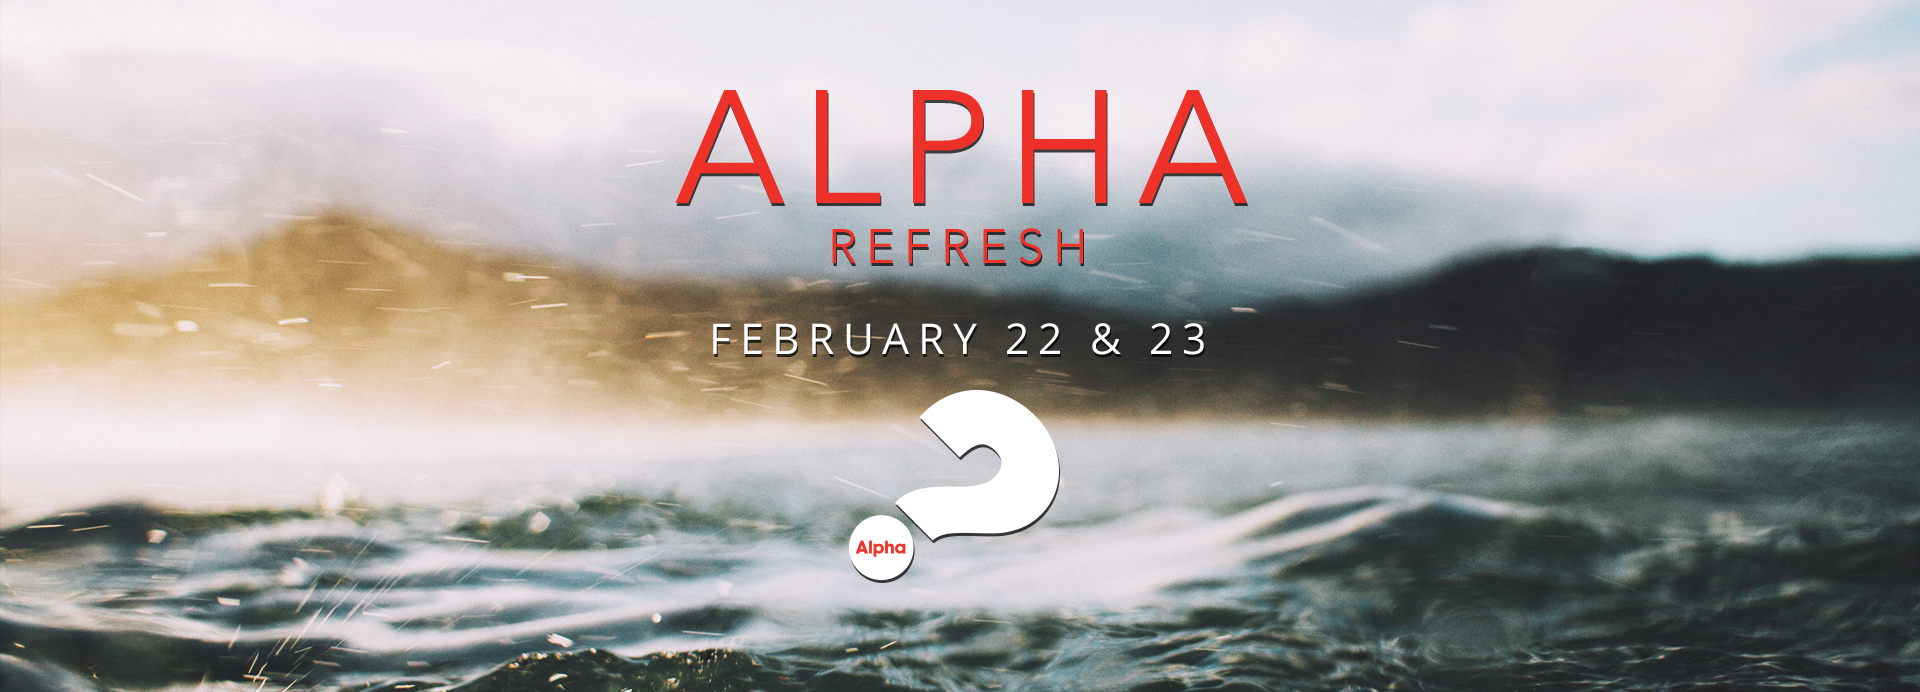 Alpha Refresh 1920x692.jpg